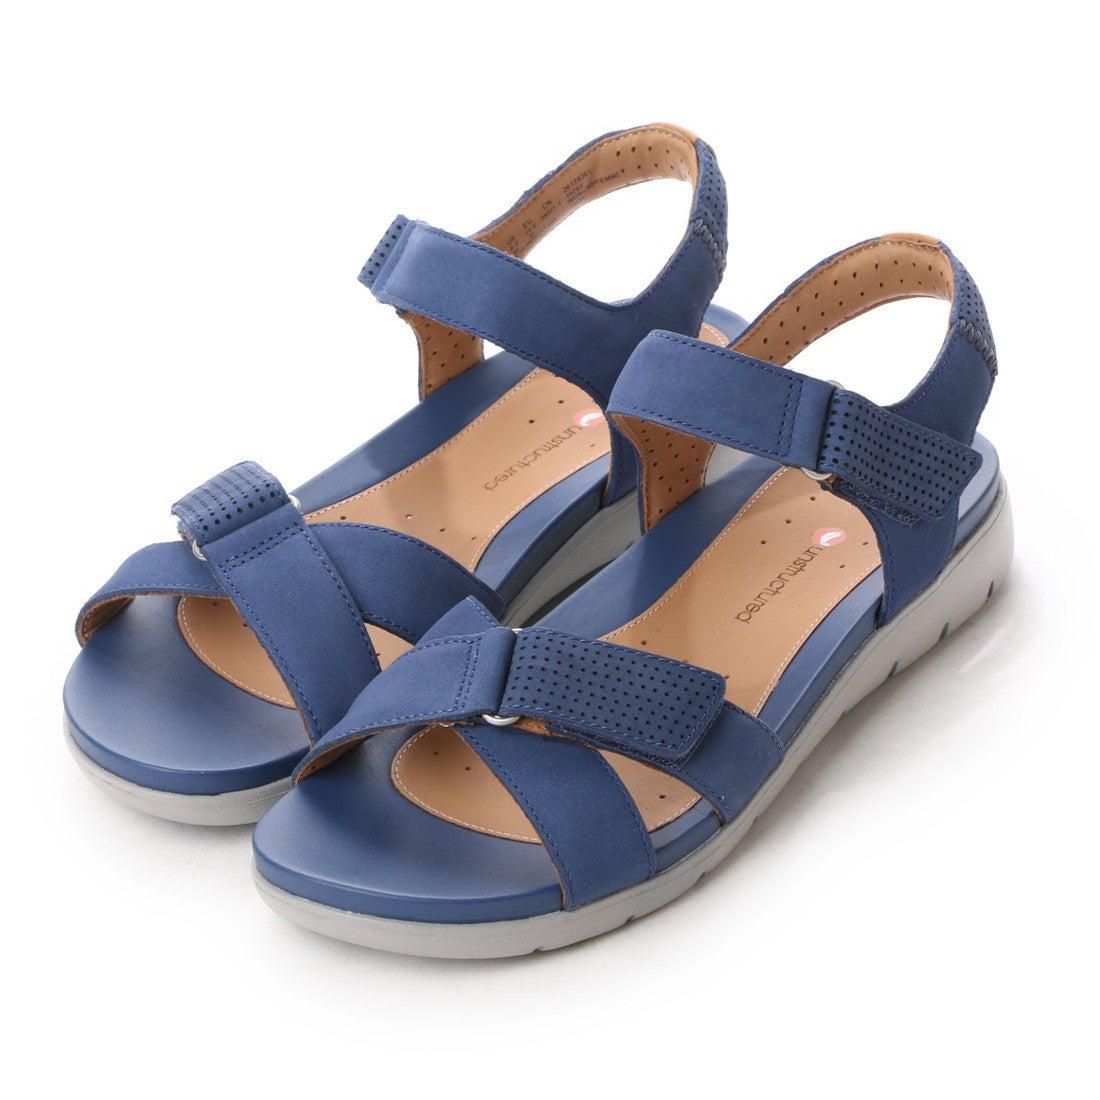 11f8d6996d0e Clarks Un Saffron   アンサフラン (ブルー) -アウトレット通販 ロコレット (LOCOLET)